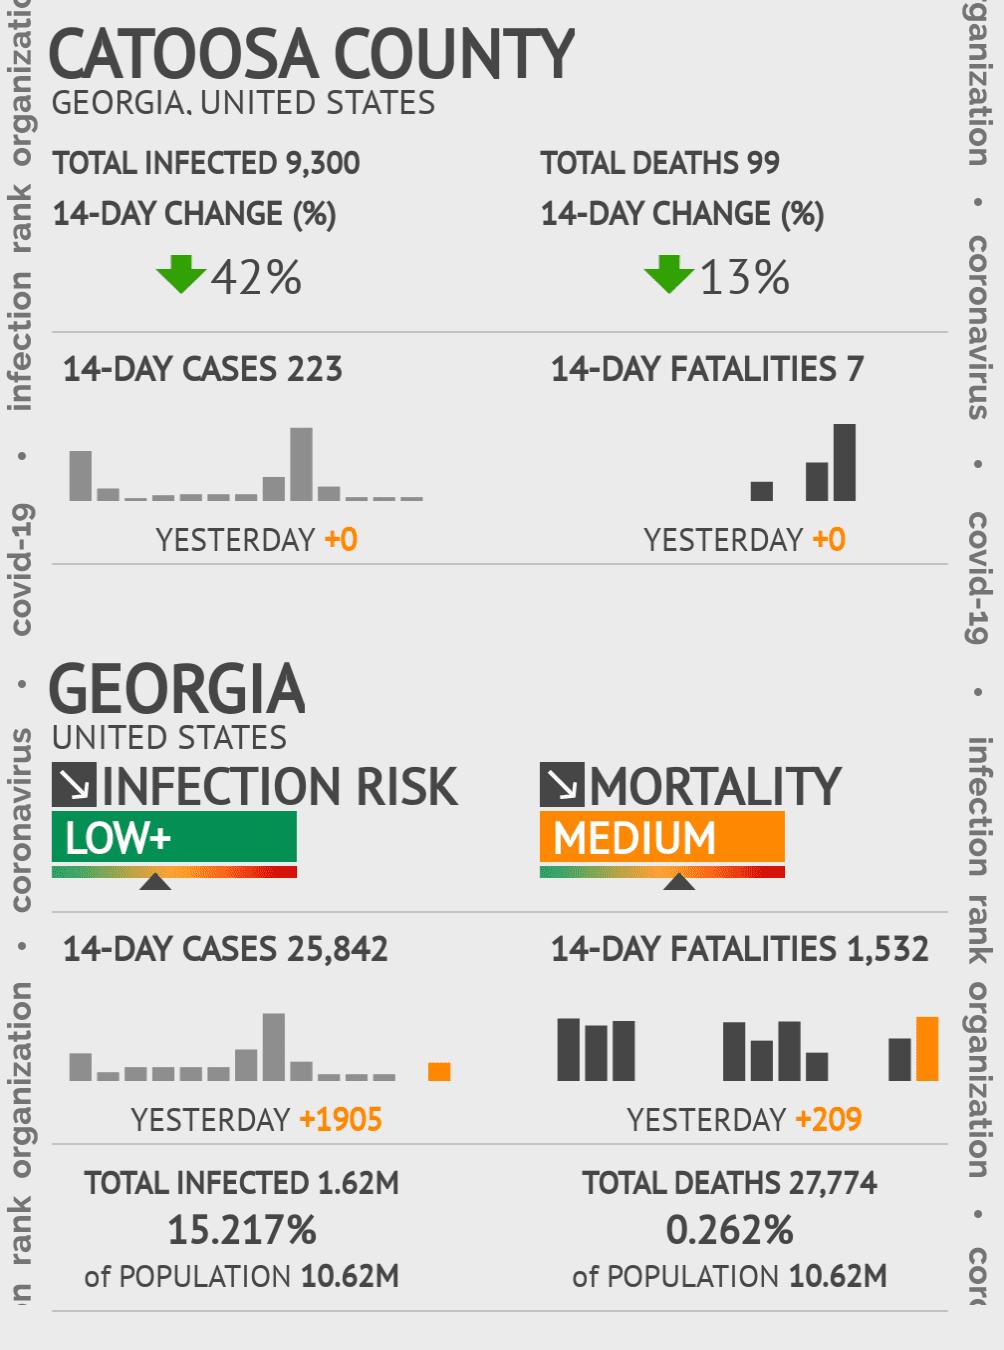 Catoosa County Coronavirus Covid-19 Risk of Infection on July 24, 2021